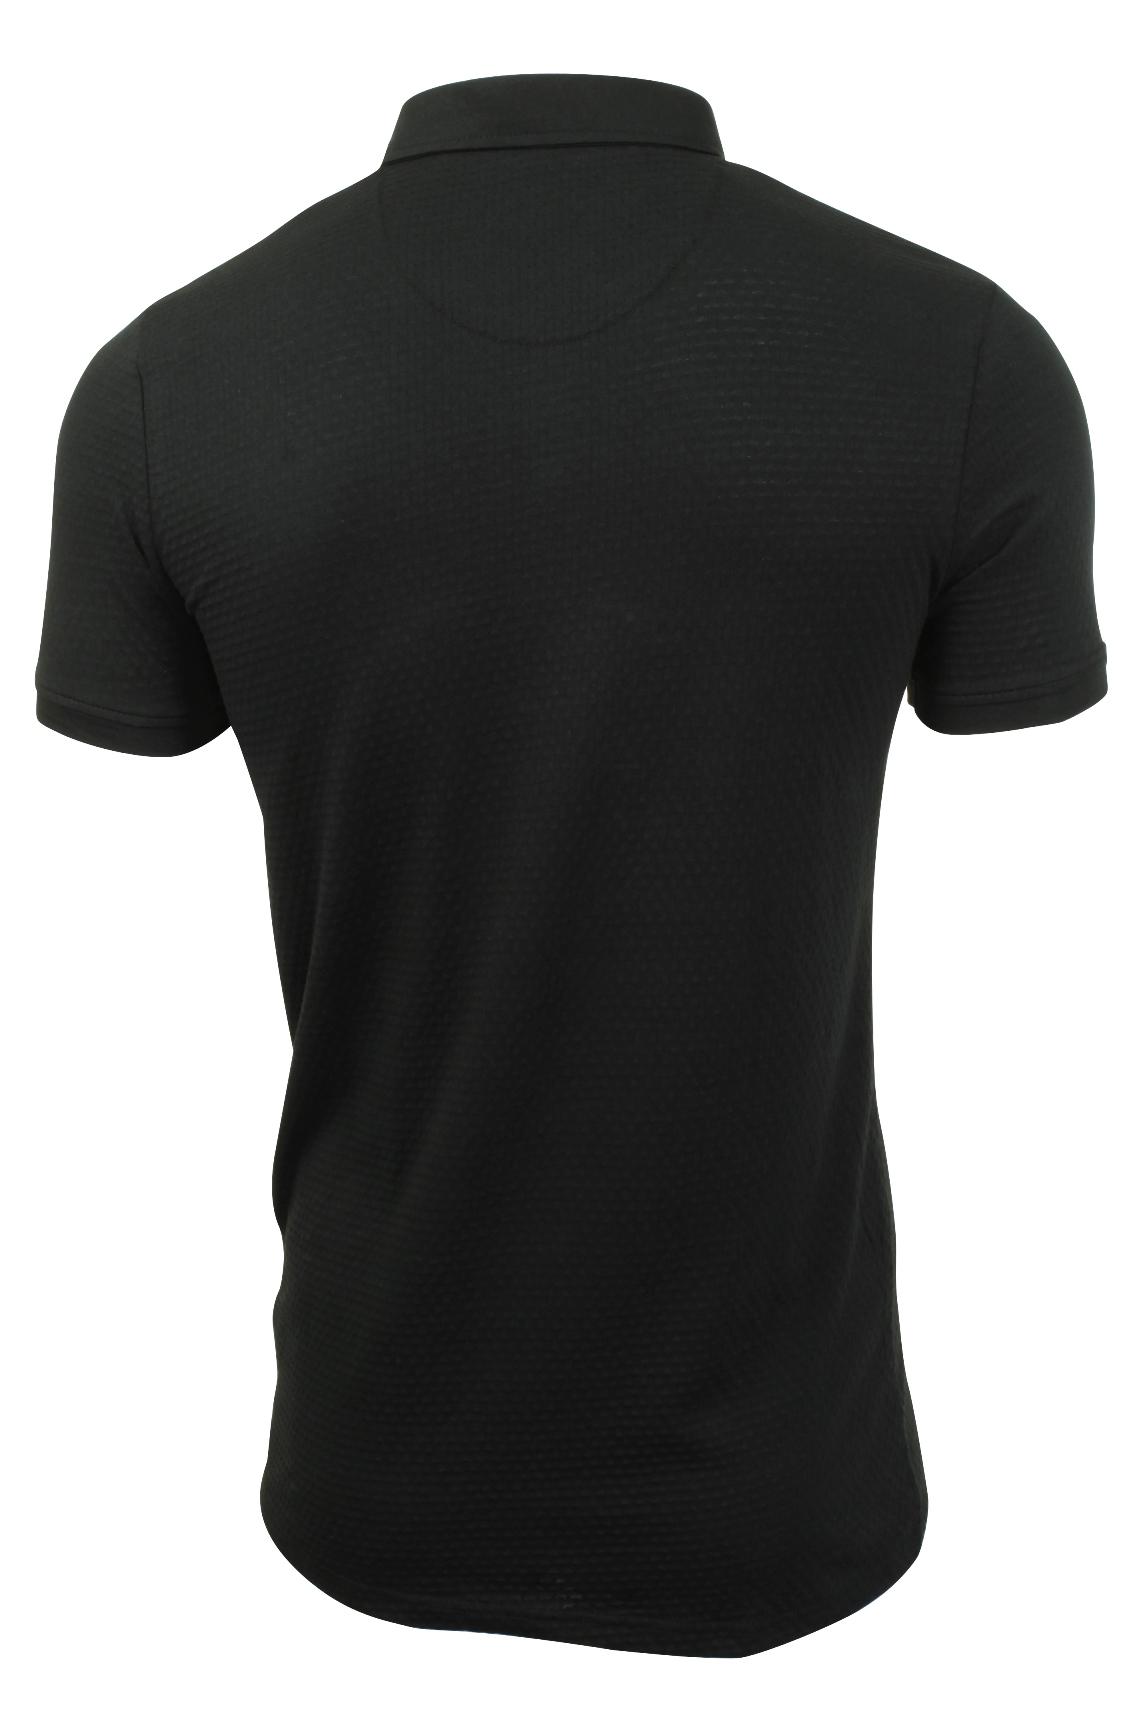 Mens-Polo-Shirt-by-Brave-Soul-Short-Sleeved thumbnail 5